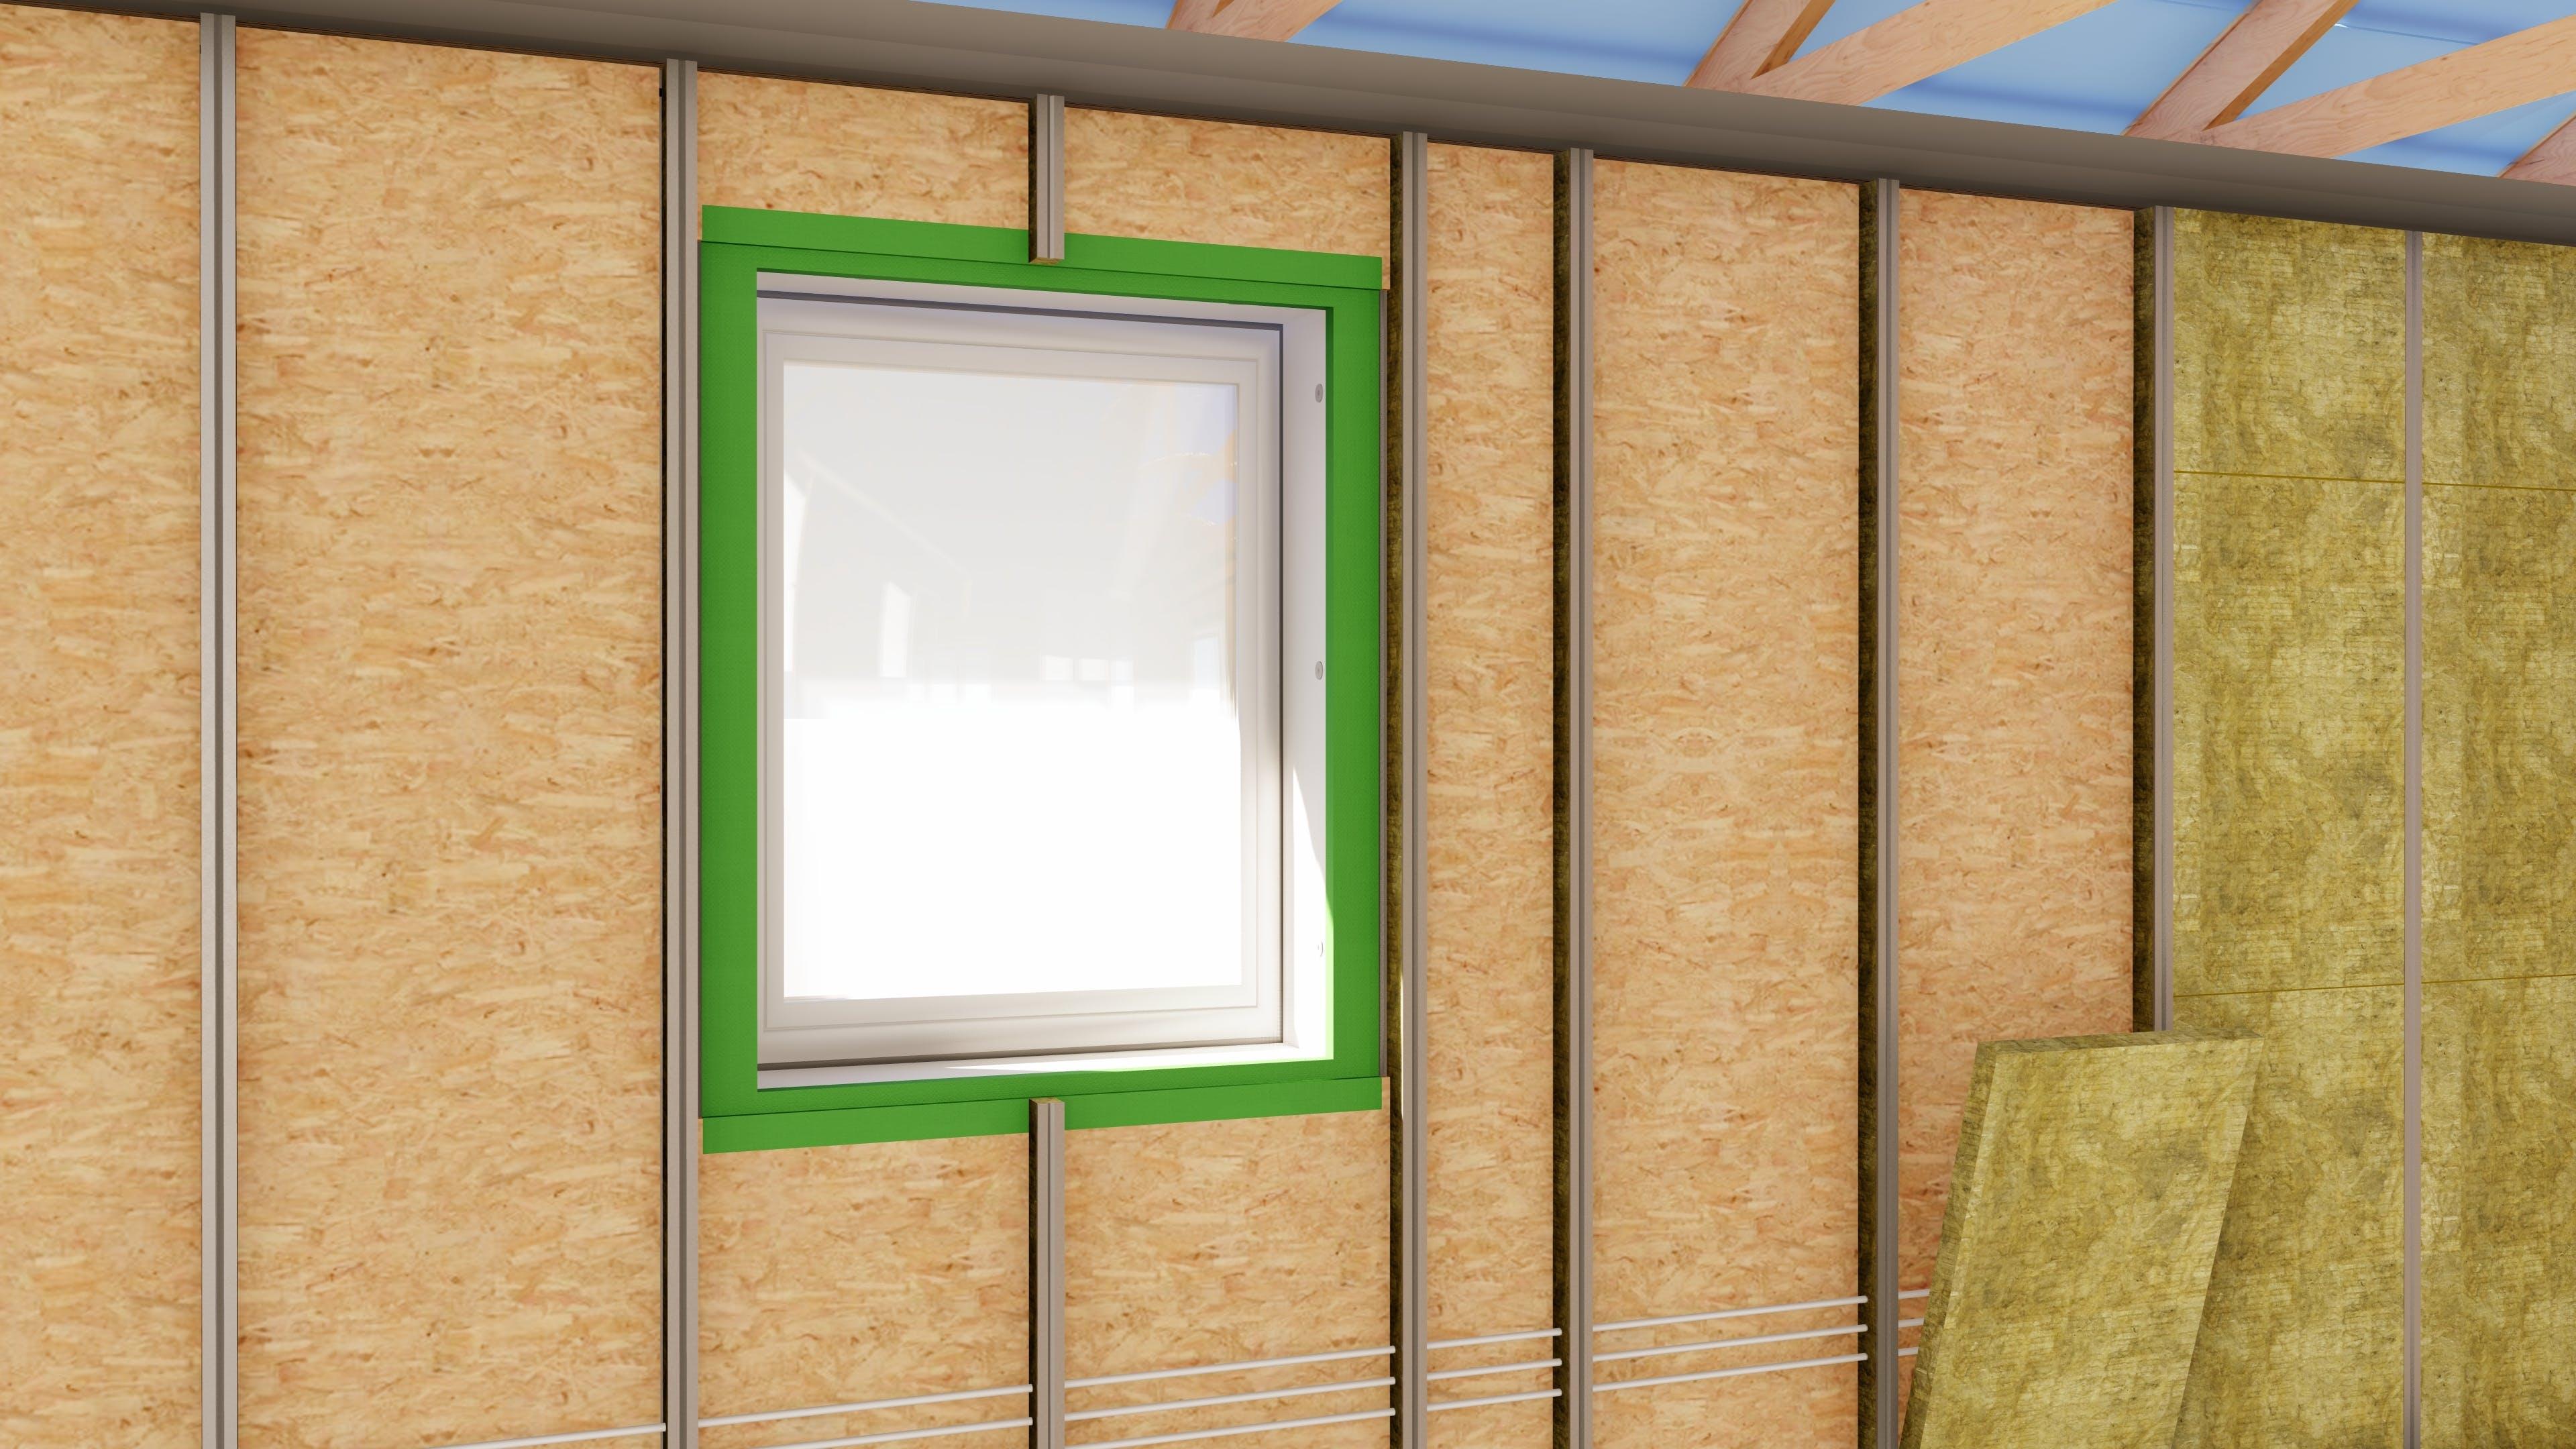 Rockzero, campaign, system, 3D, wall construction, internal insulation